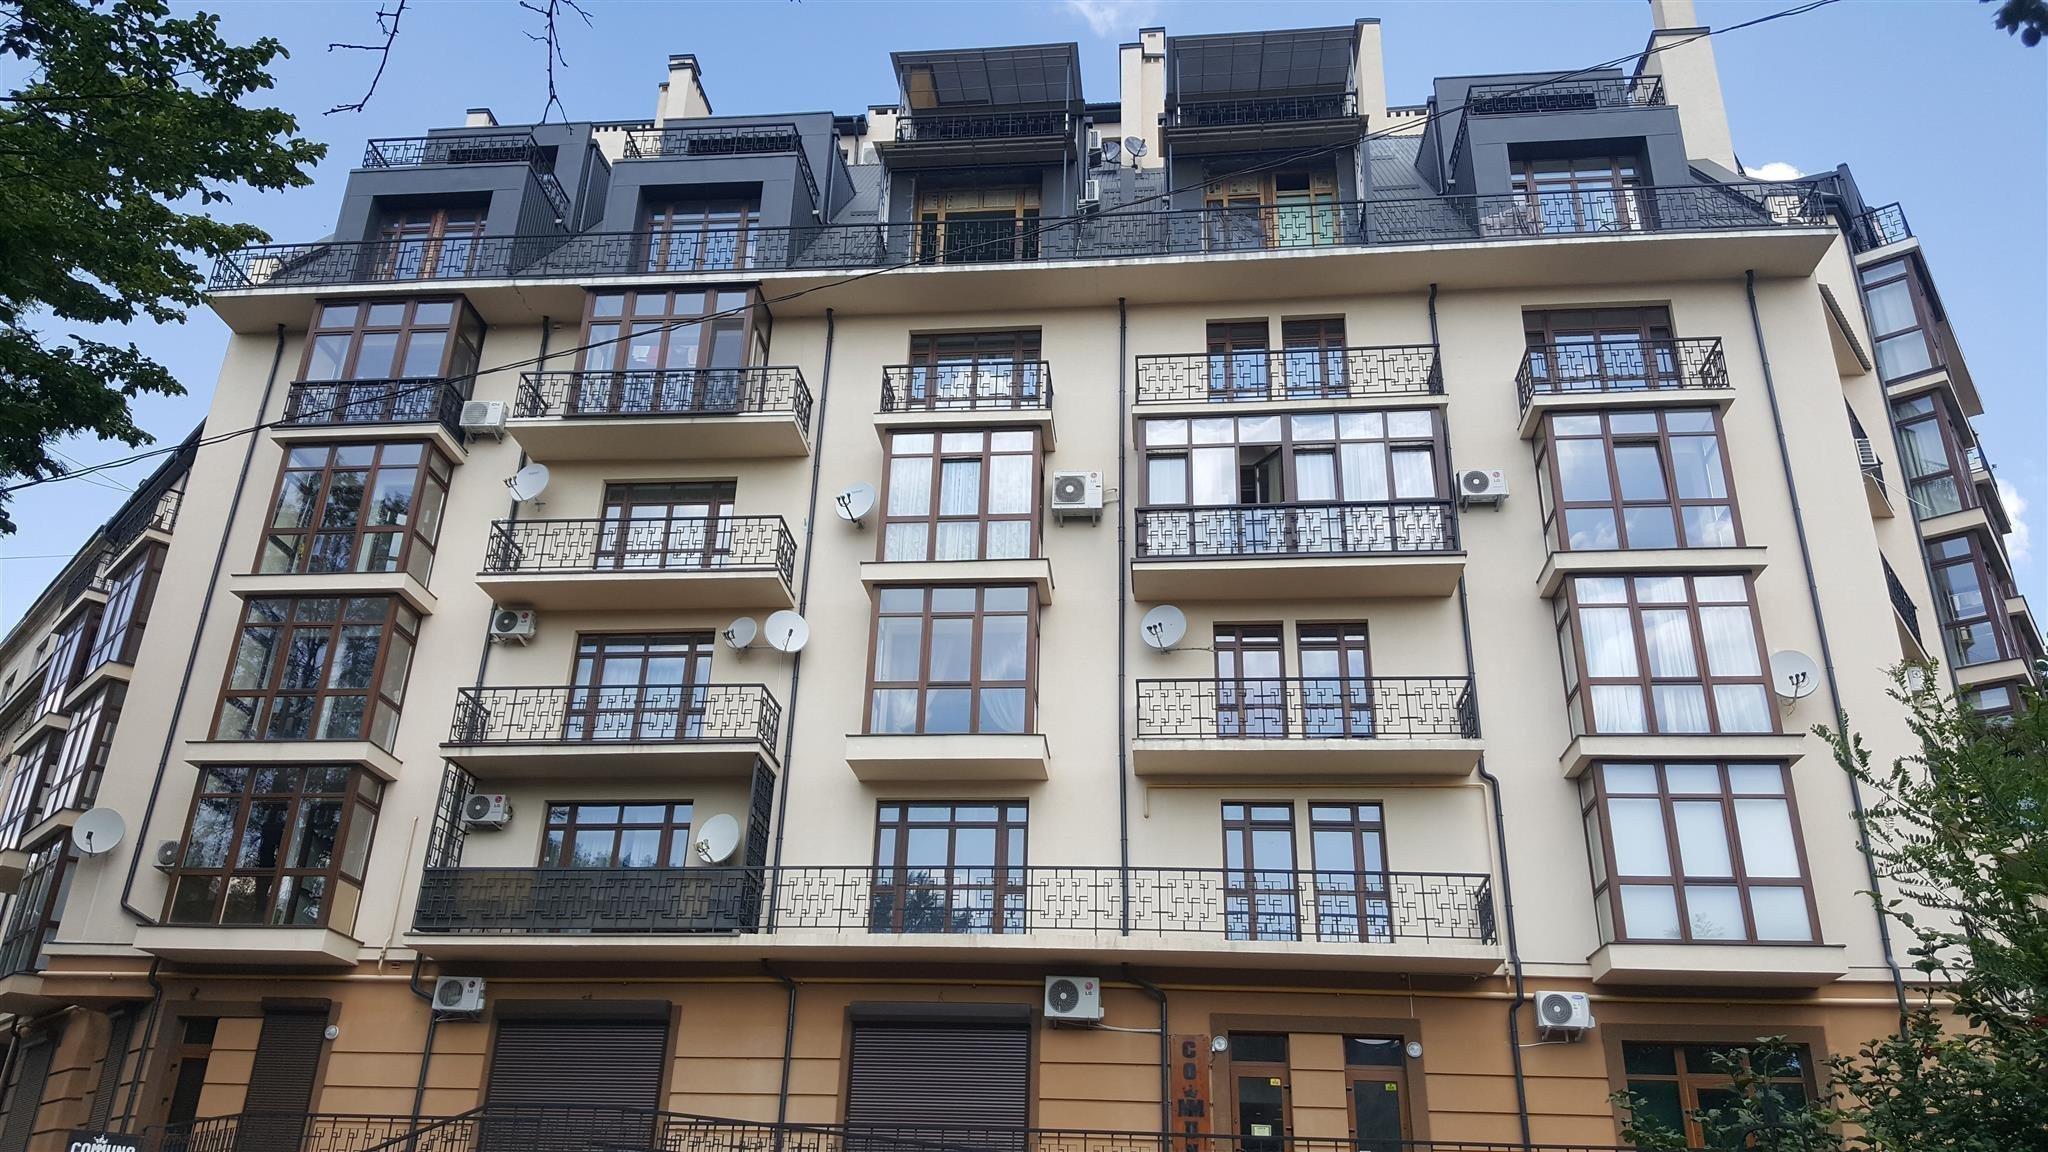 Photo: Sale flat in Lviv. Announcement № 5979